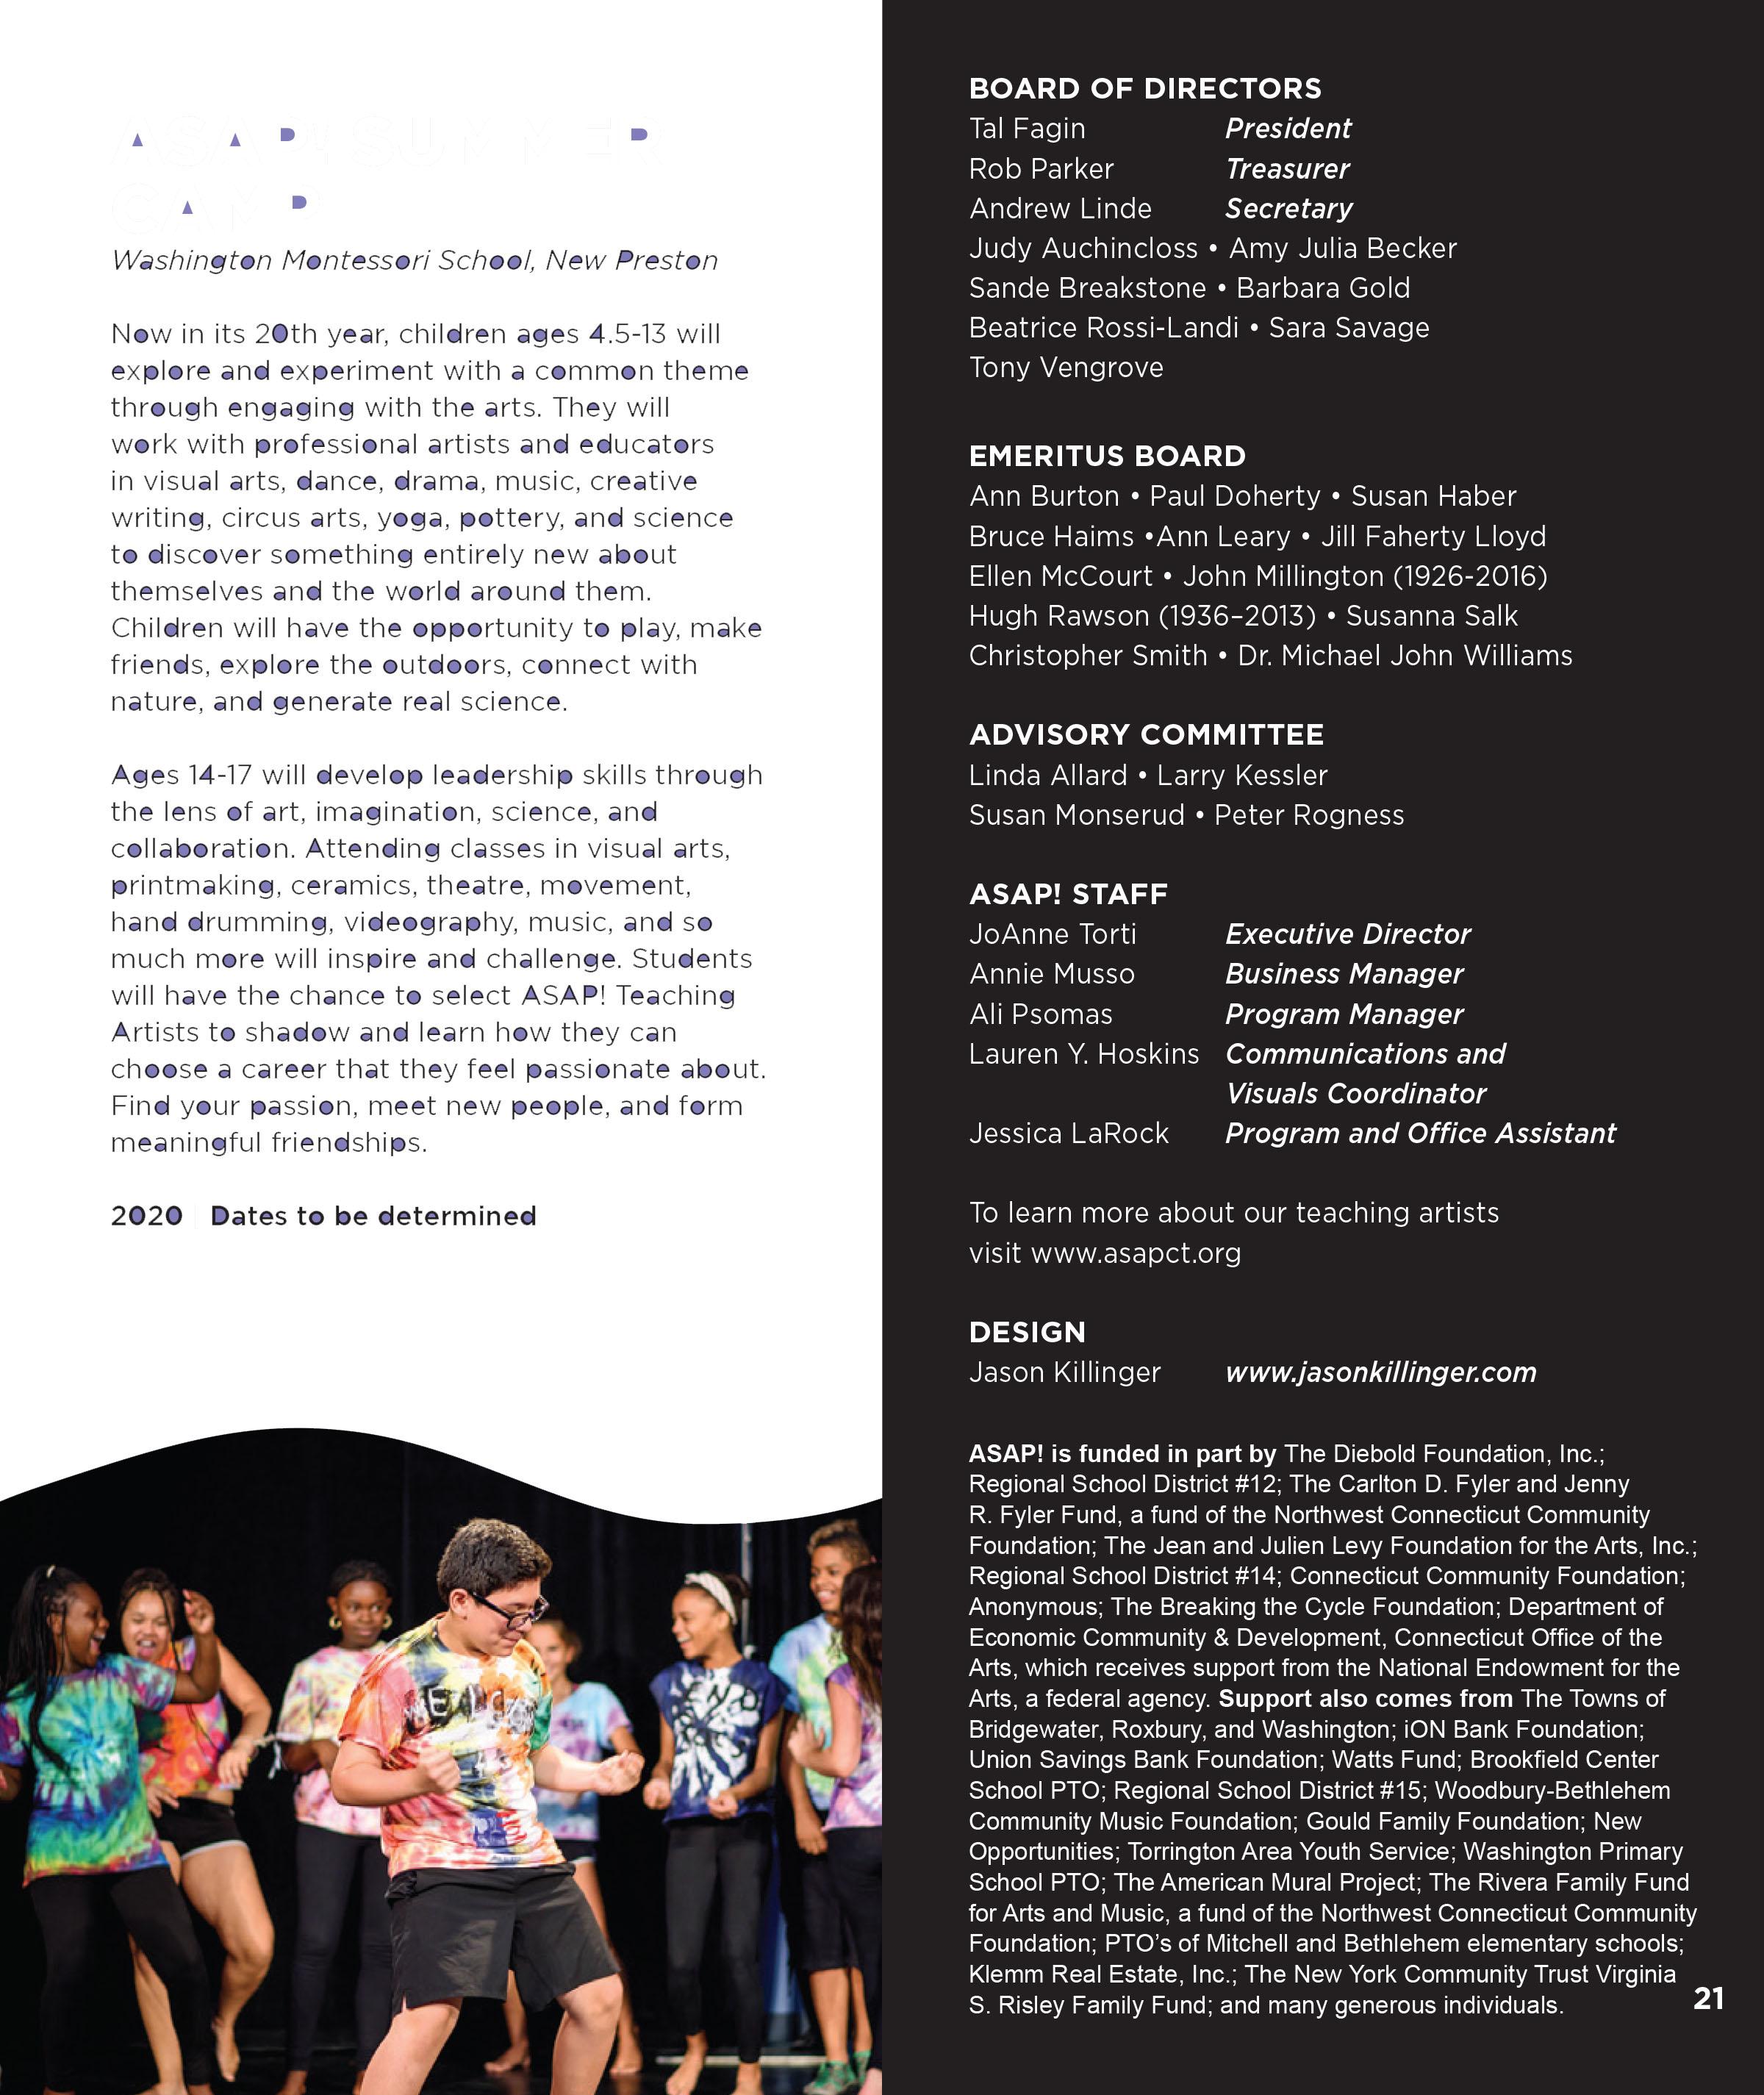 ASAP_19_Catalog_websinglepage 21